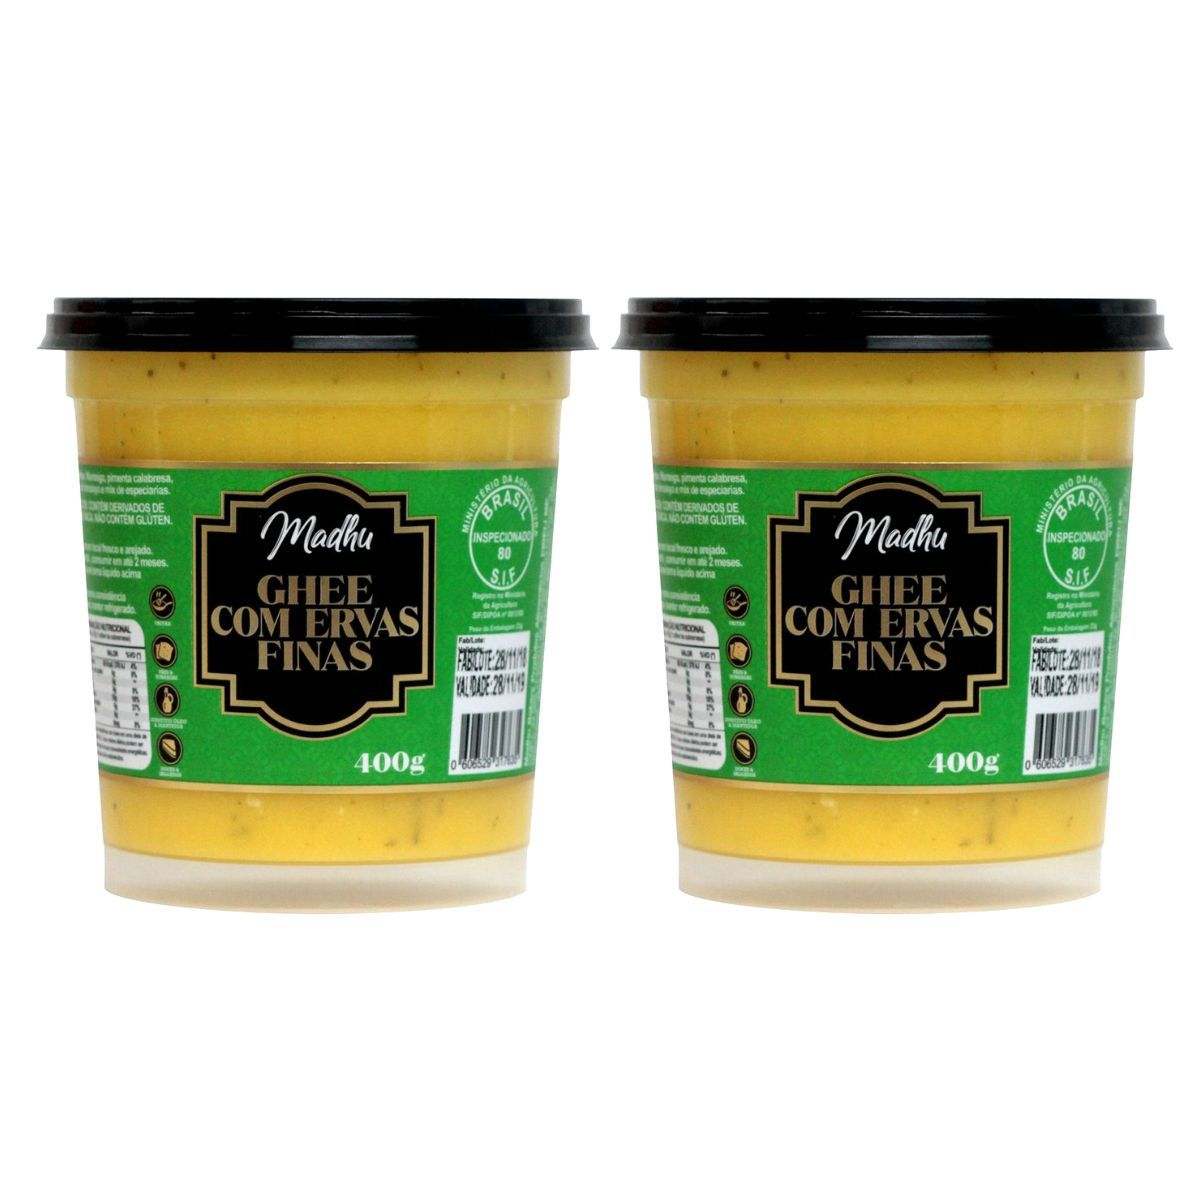 Kit 2 Manteigas Ghee 400g Clarificada C/ Ervas Finas Zero Lactose - Madhu